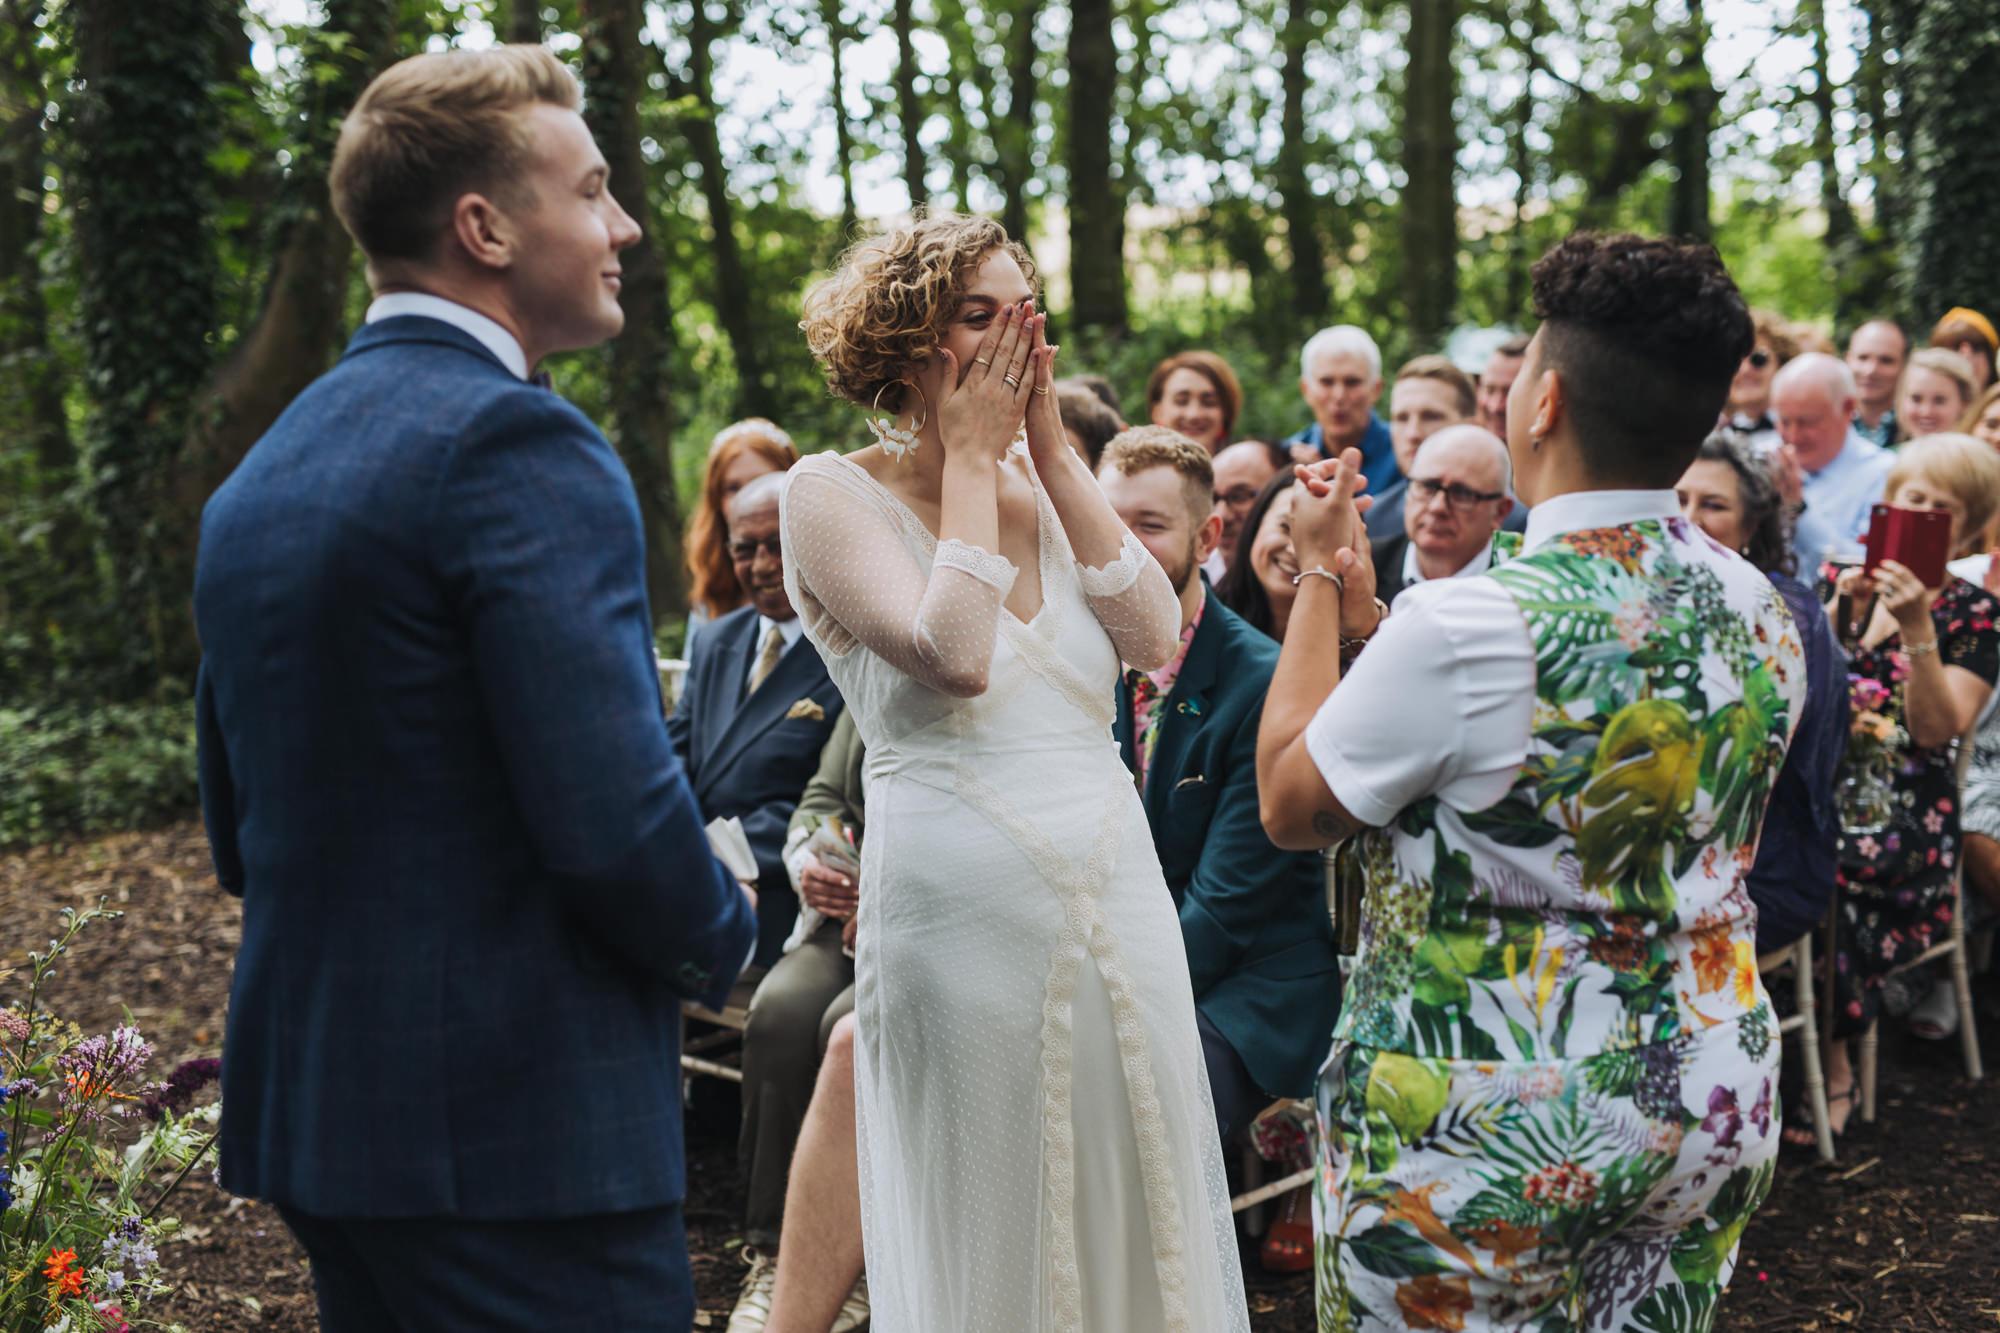 applewood wedding photographer leeds, yorkshire35.jpg